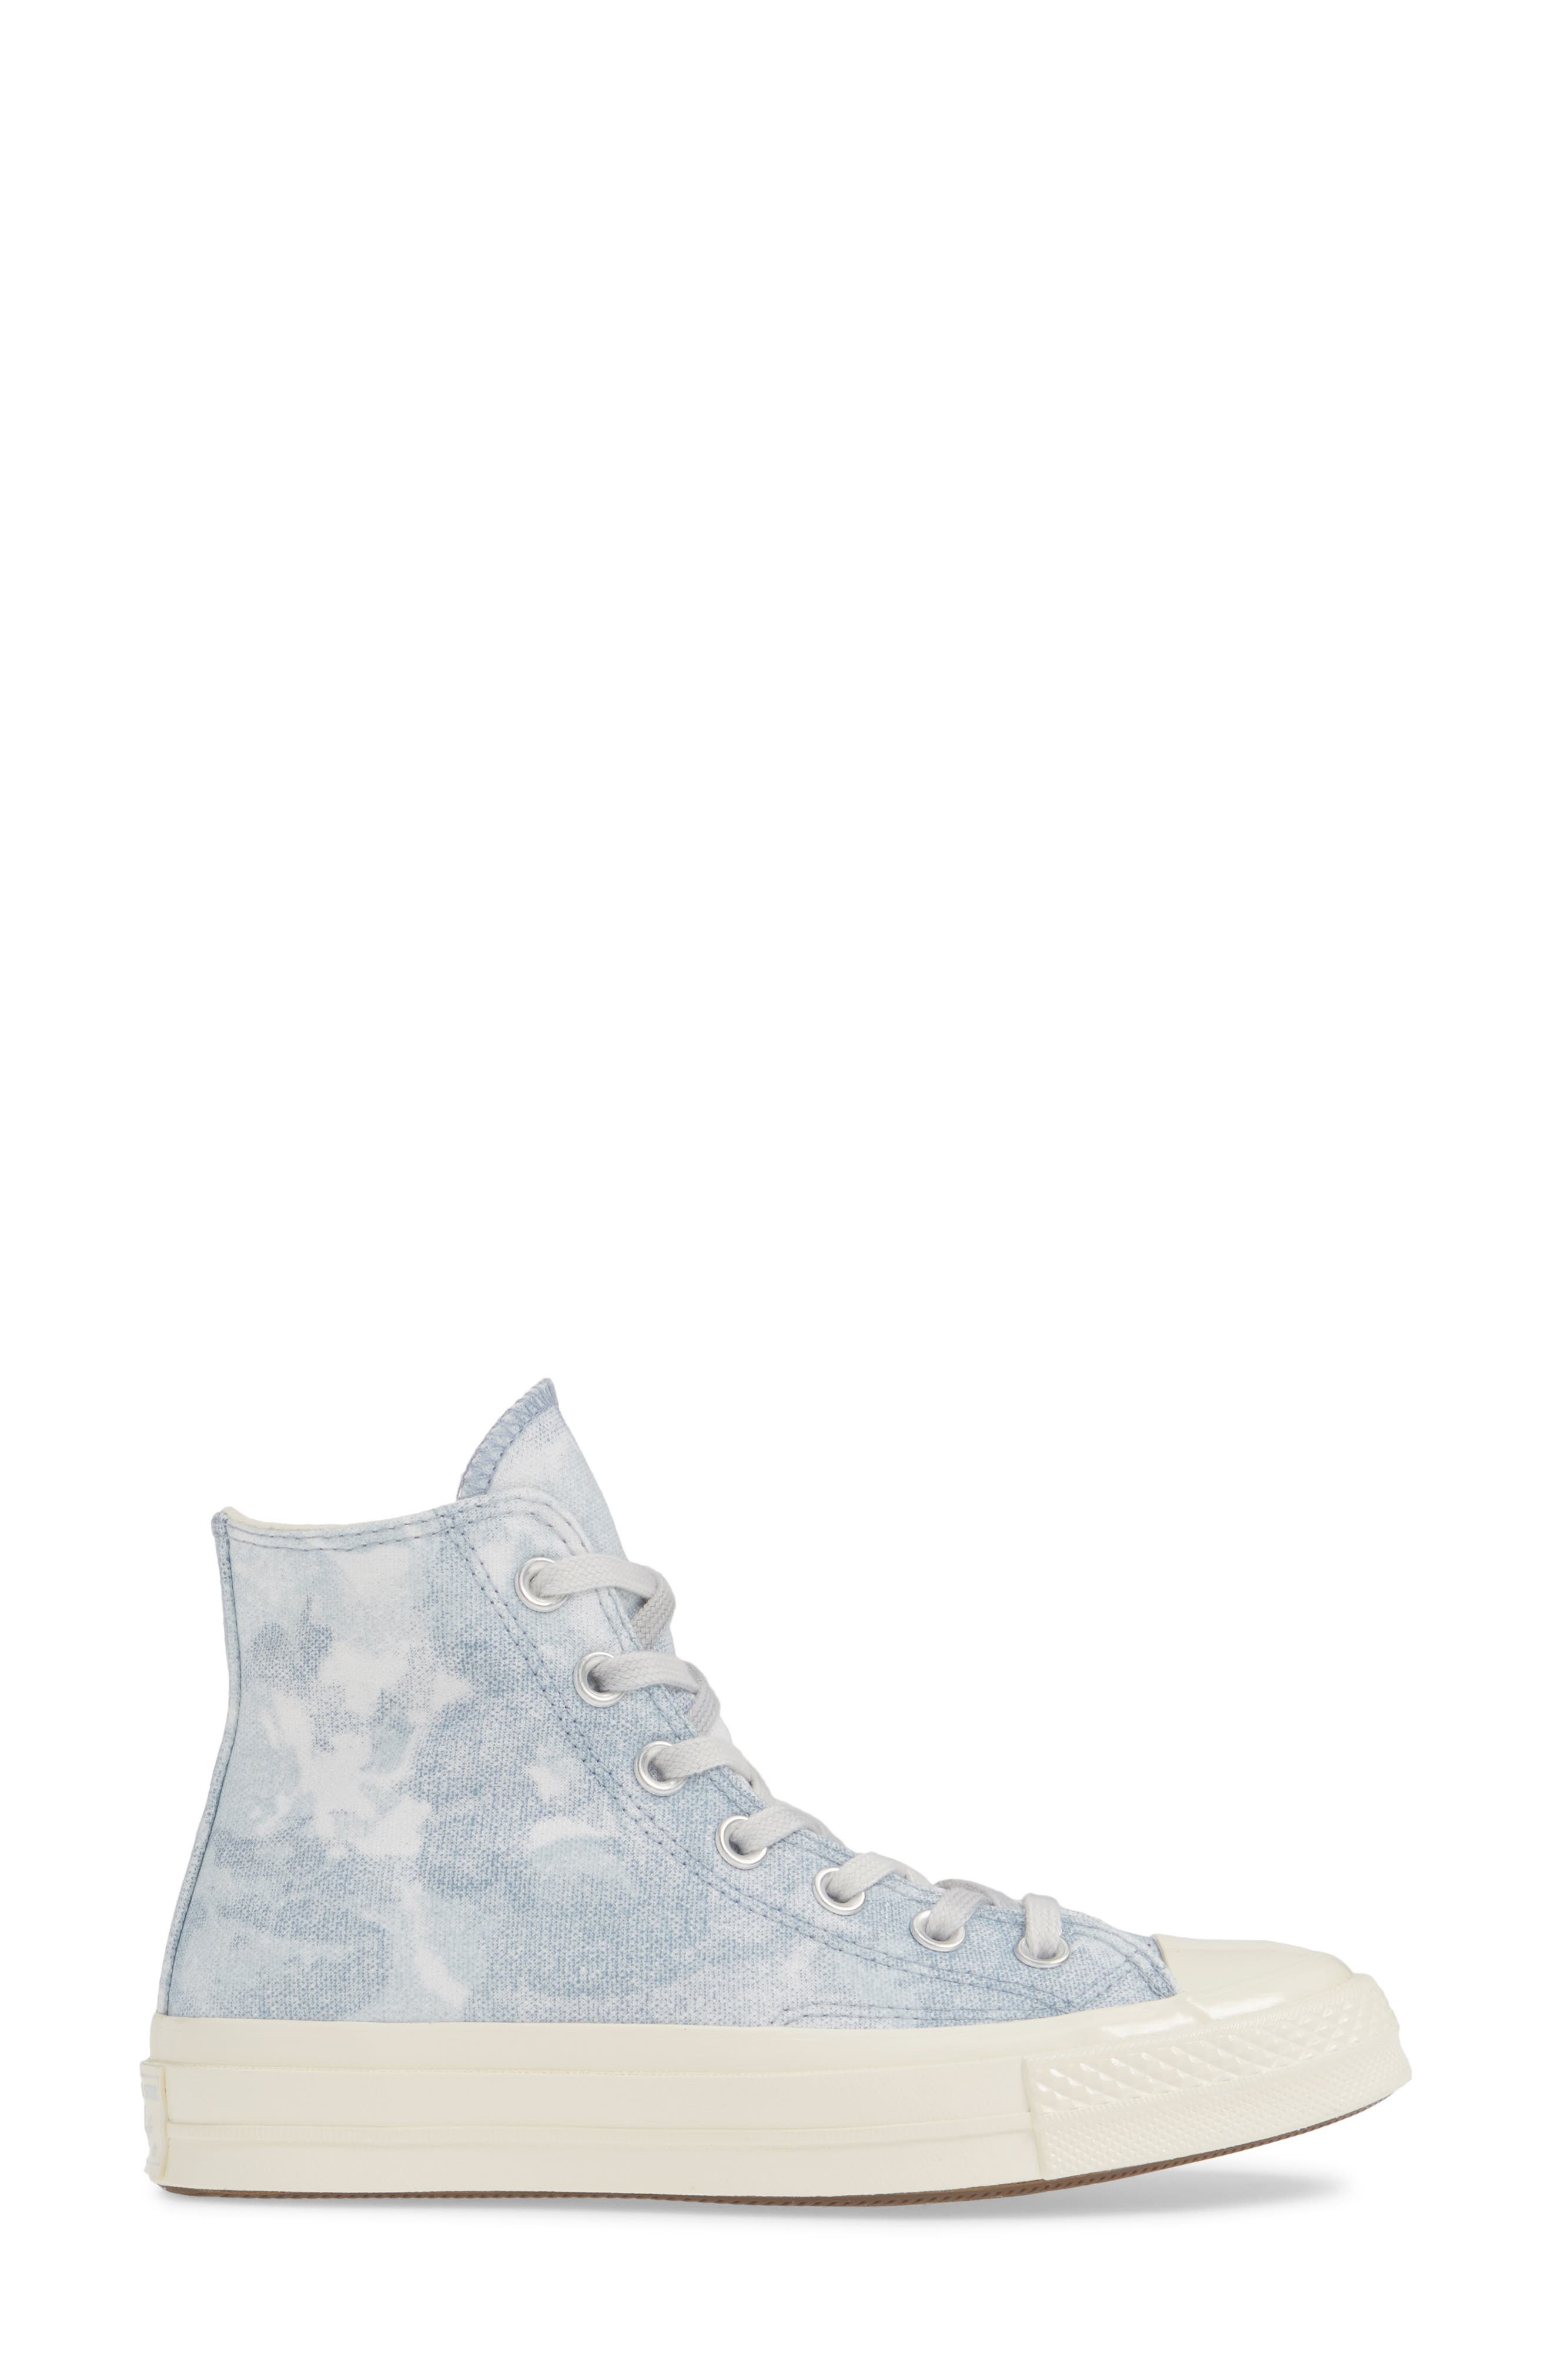 CONVERSE, Chuck Taylor<sup>®</sup> All Star<sup>®</sup> 70 High Top Sneaker, Alternate thumbnail 3, color, INDIGO FOG/ PLATINUM/ EGRET